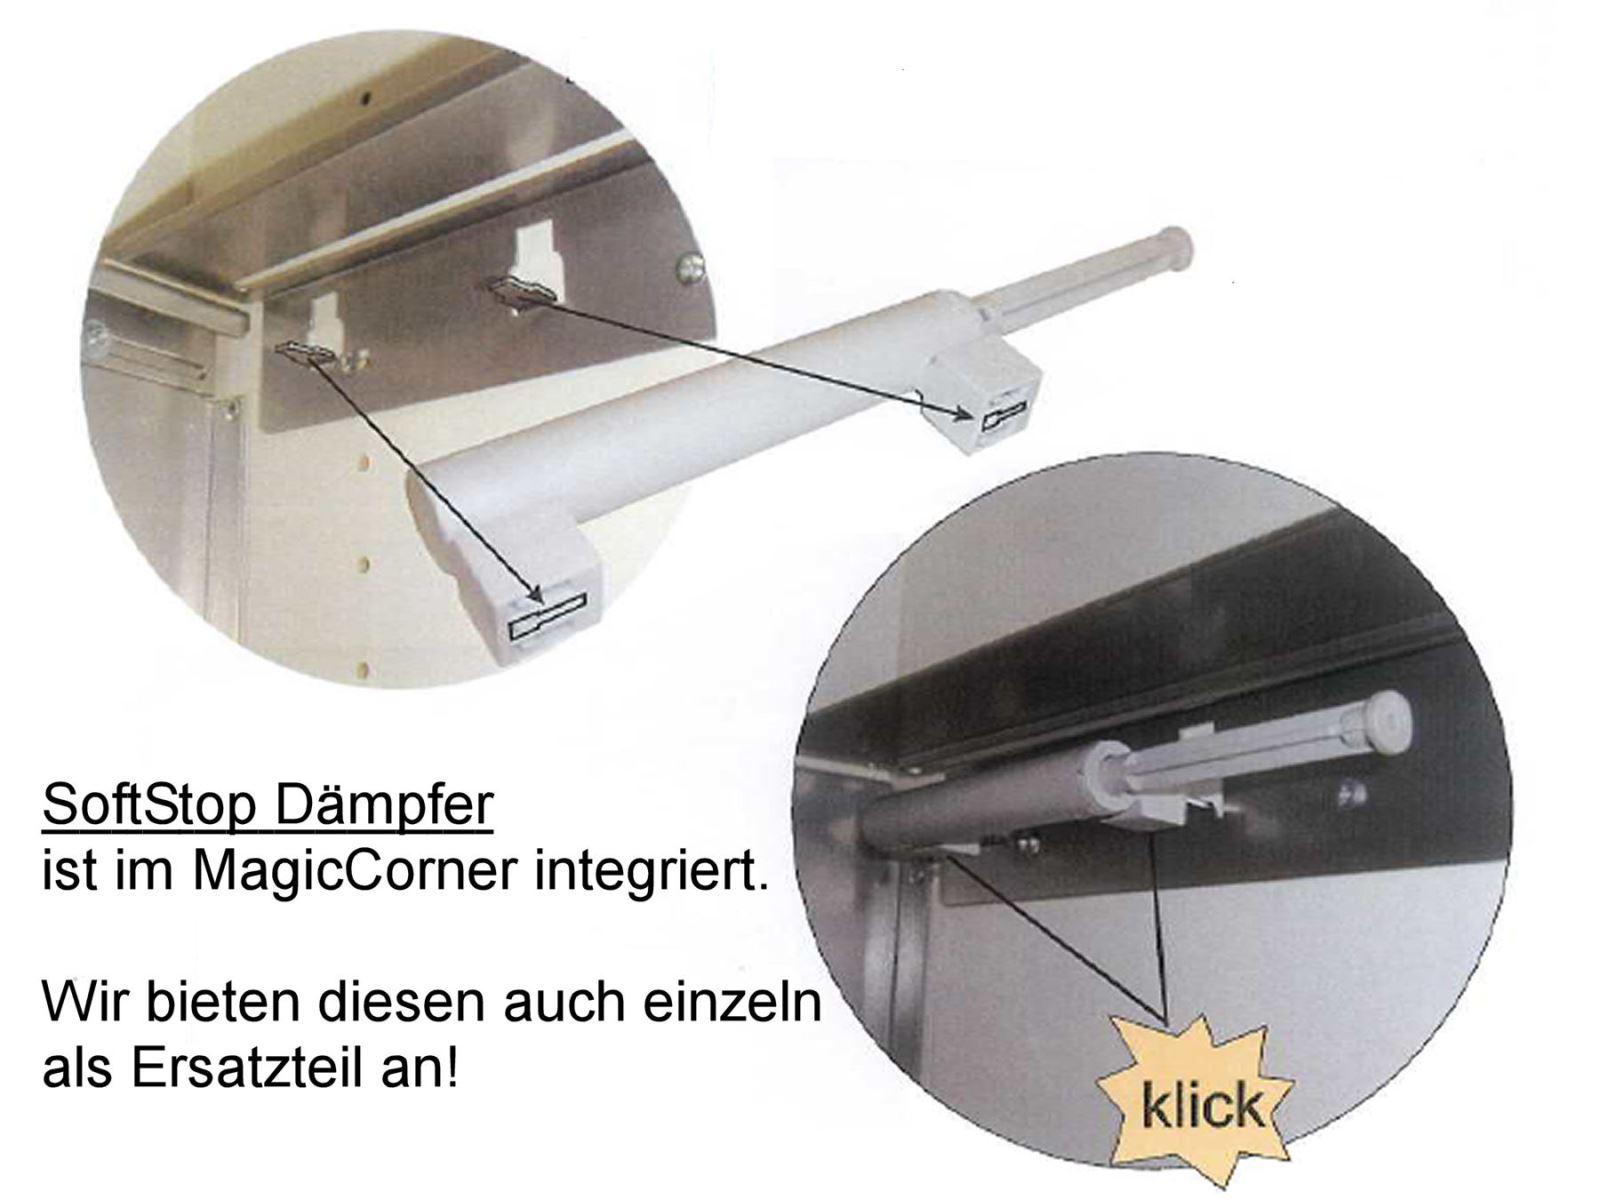 Ikea Mandal Apartment Therapy ~ Kesseboehmer MagicCorner Eckschrankbeschlag Eckschrank Schwenkauszug